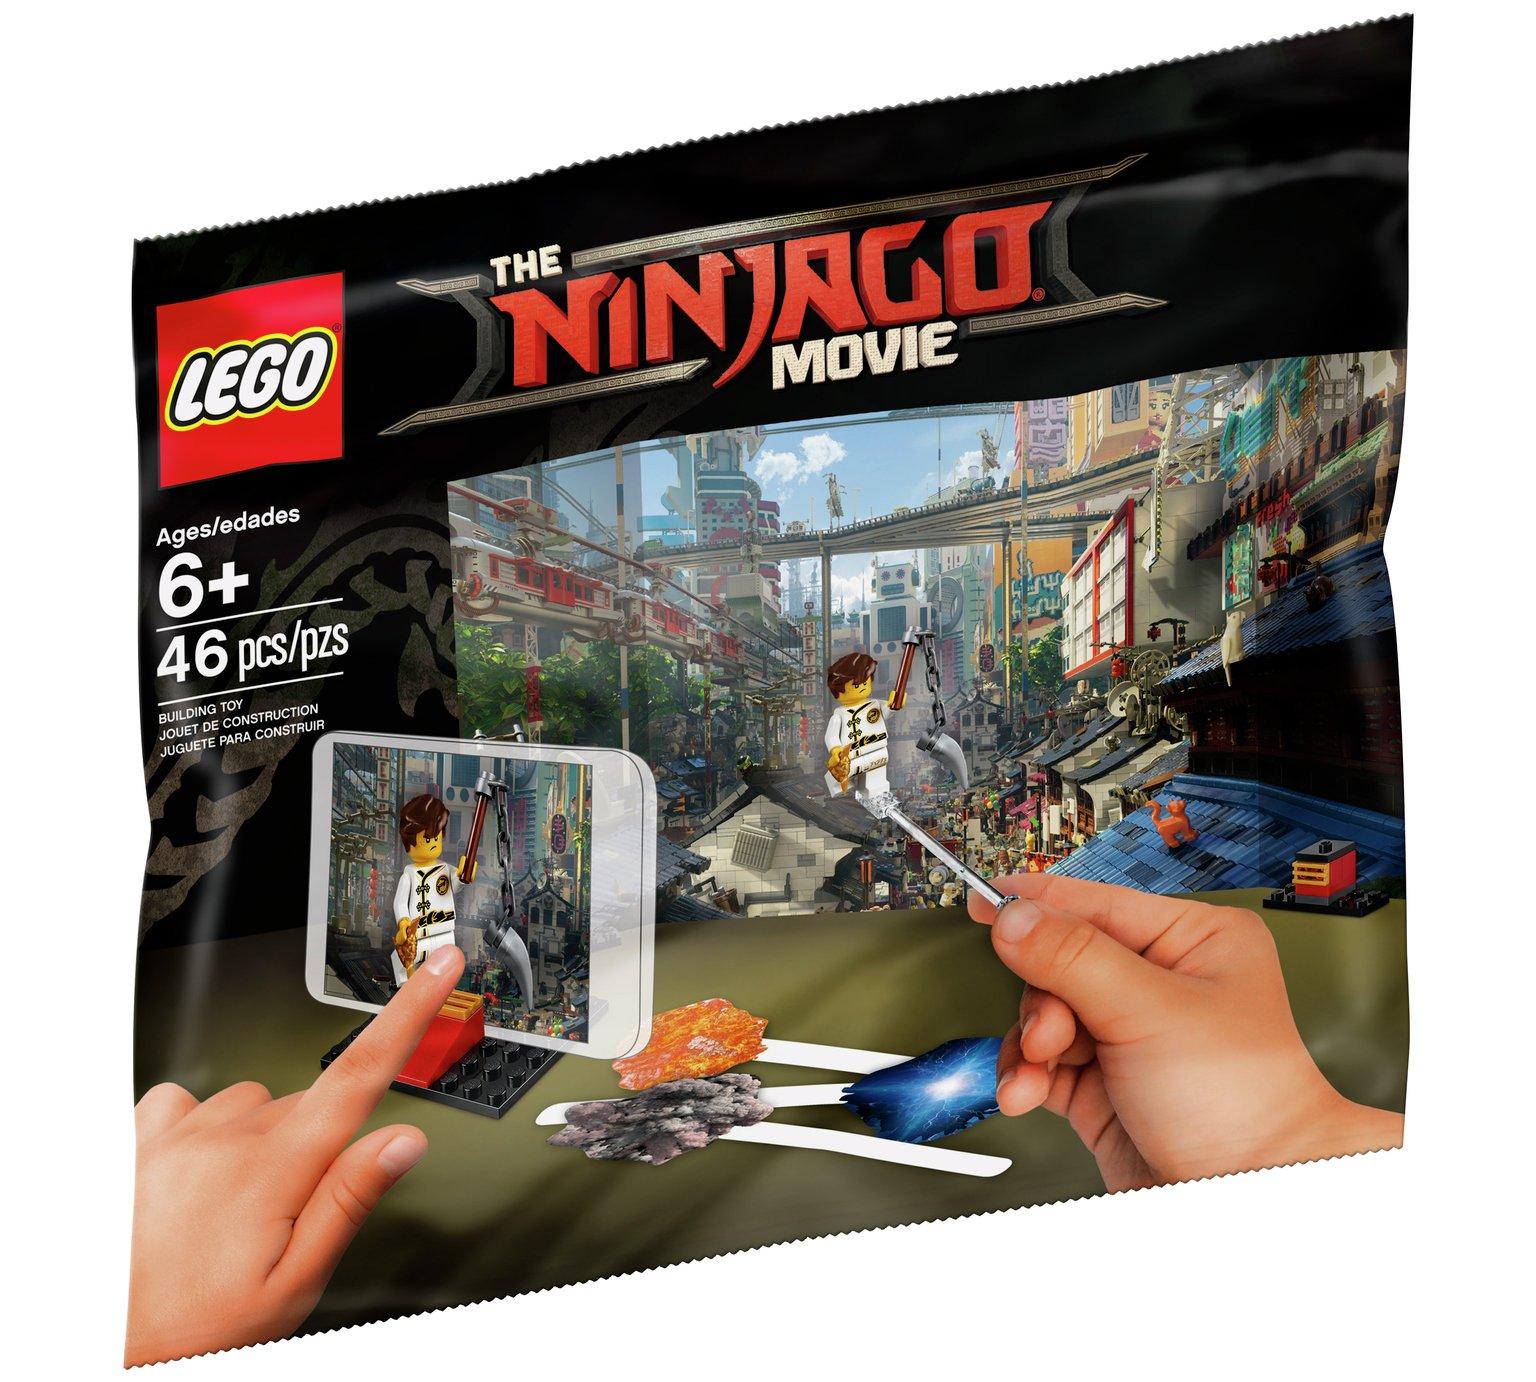 LEGO Ninjago Movie Maker - 5004394 - 99p @ Argos (free C&C)